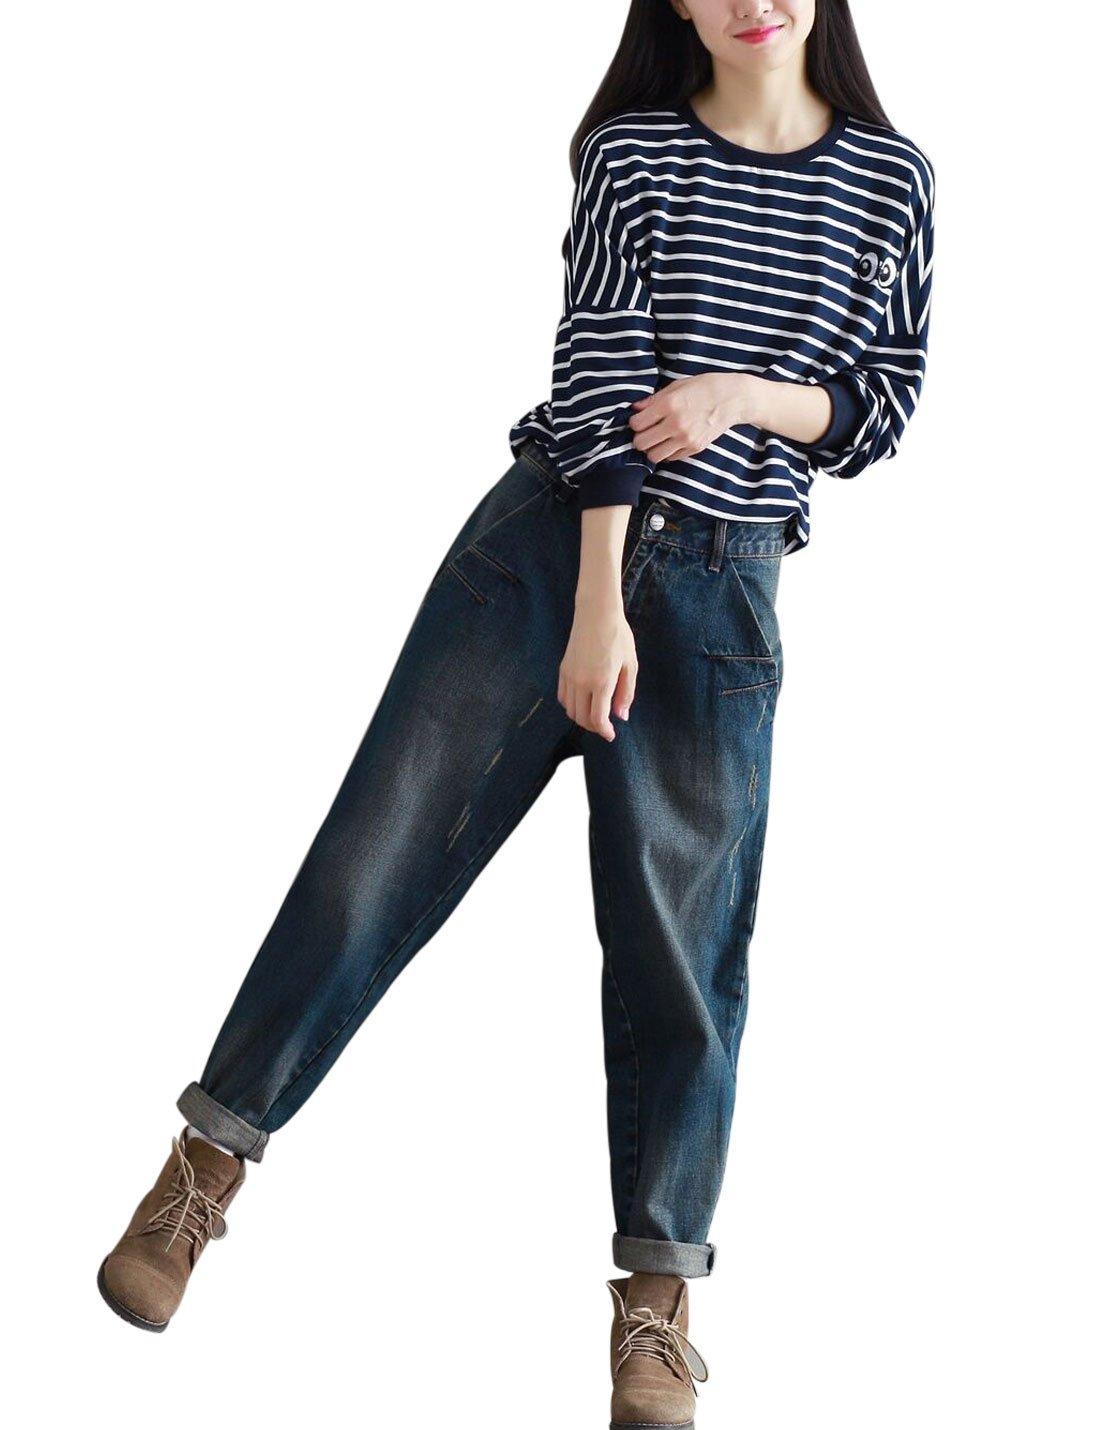 Yeokou Women's Casual Loose Distressed Baggy Harem Denim Jeans Cropped Pants (Large, Dark Blue) by Yeokou (Image #4)